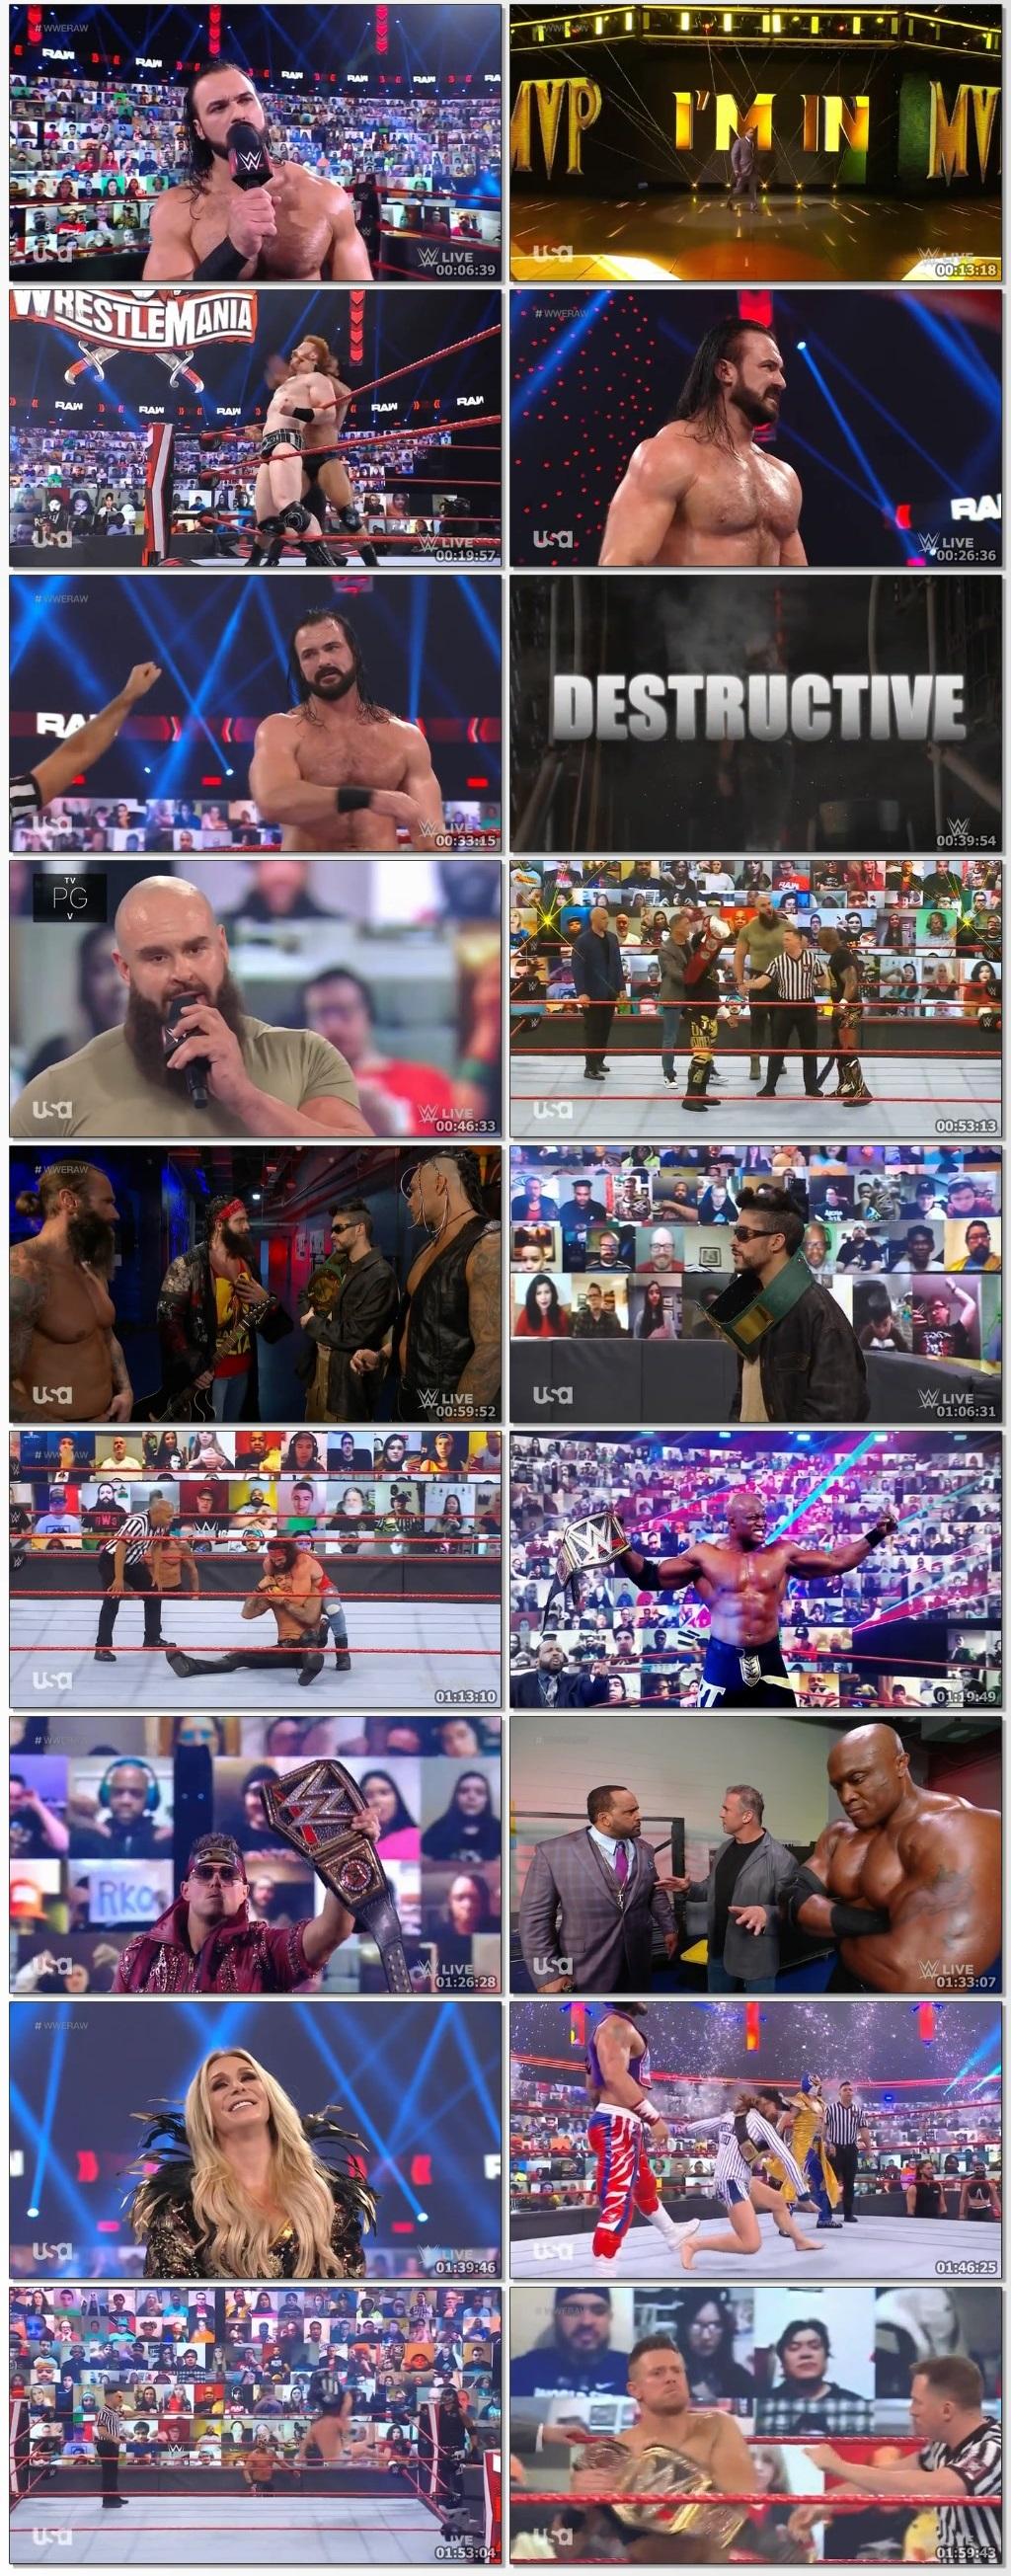 WWE-Monday-Night-Raw-1-March-2021-www-7-Star-HD-Dev-English-720p-HDTV-1-4-GB-1-mkv-thumbs